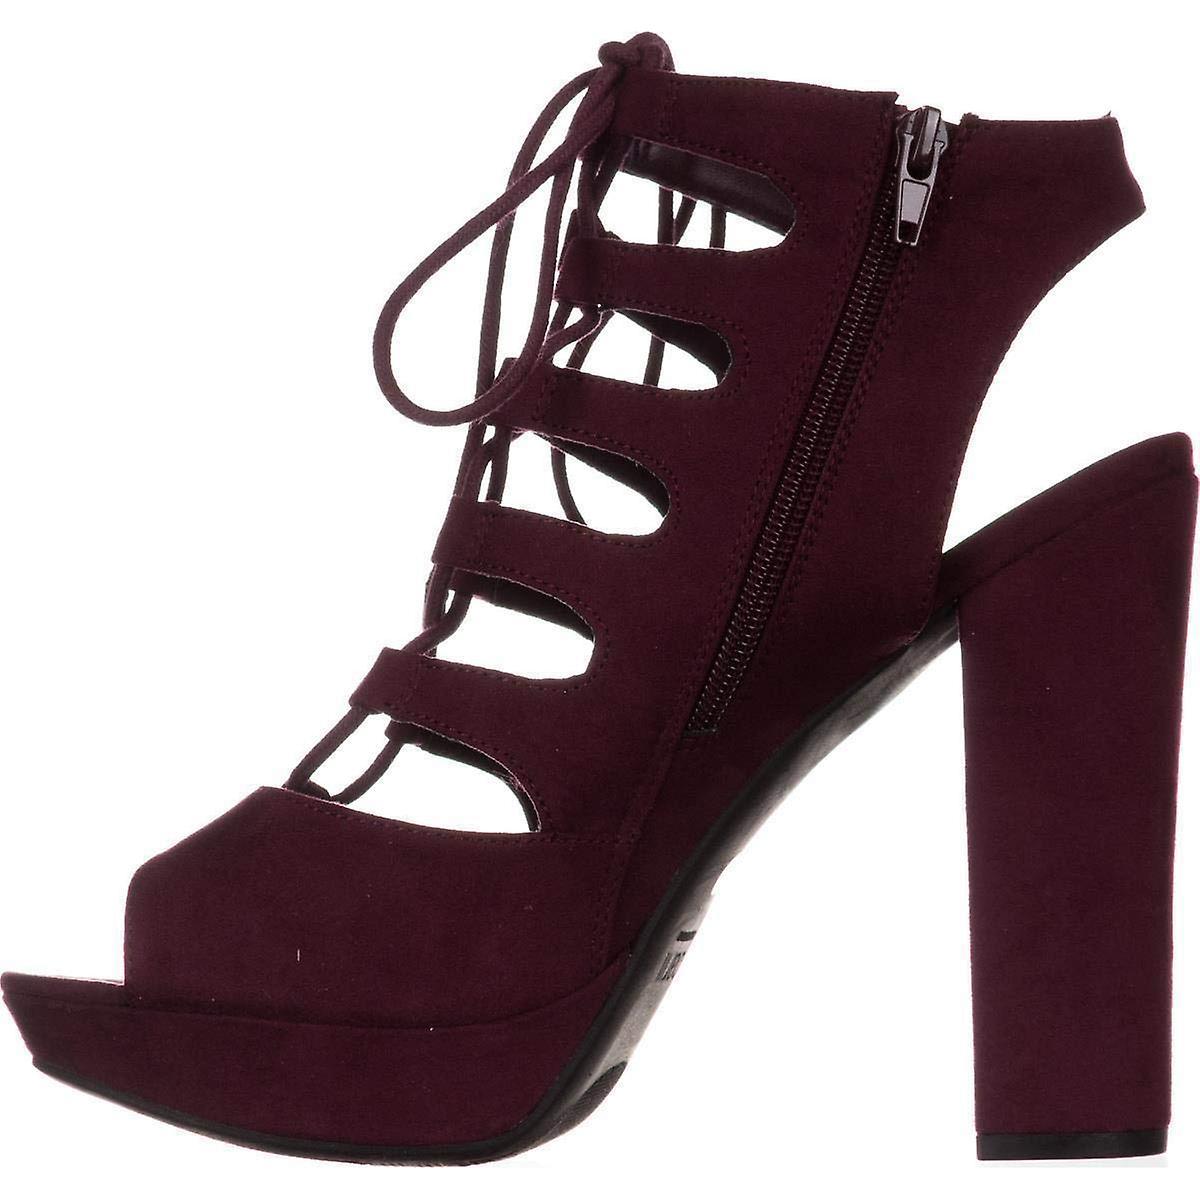 Bar III Womens Nelly åpen tå Casual Strappy sandaler